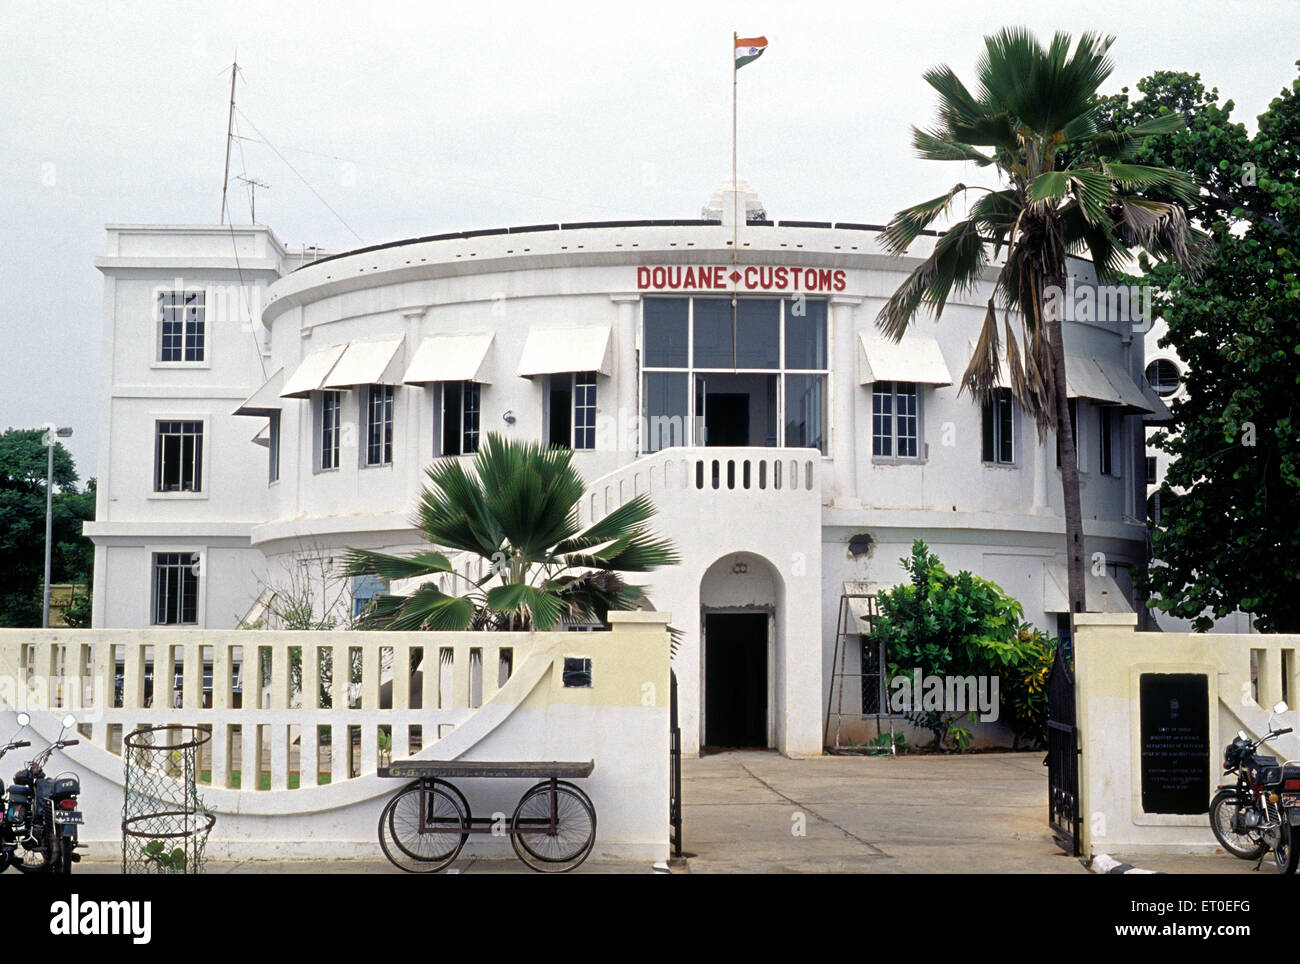 Duane customs on goubert avenue ; beach road ; Pondicherry ; Tamil Nadu ; India - Stock Image